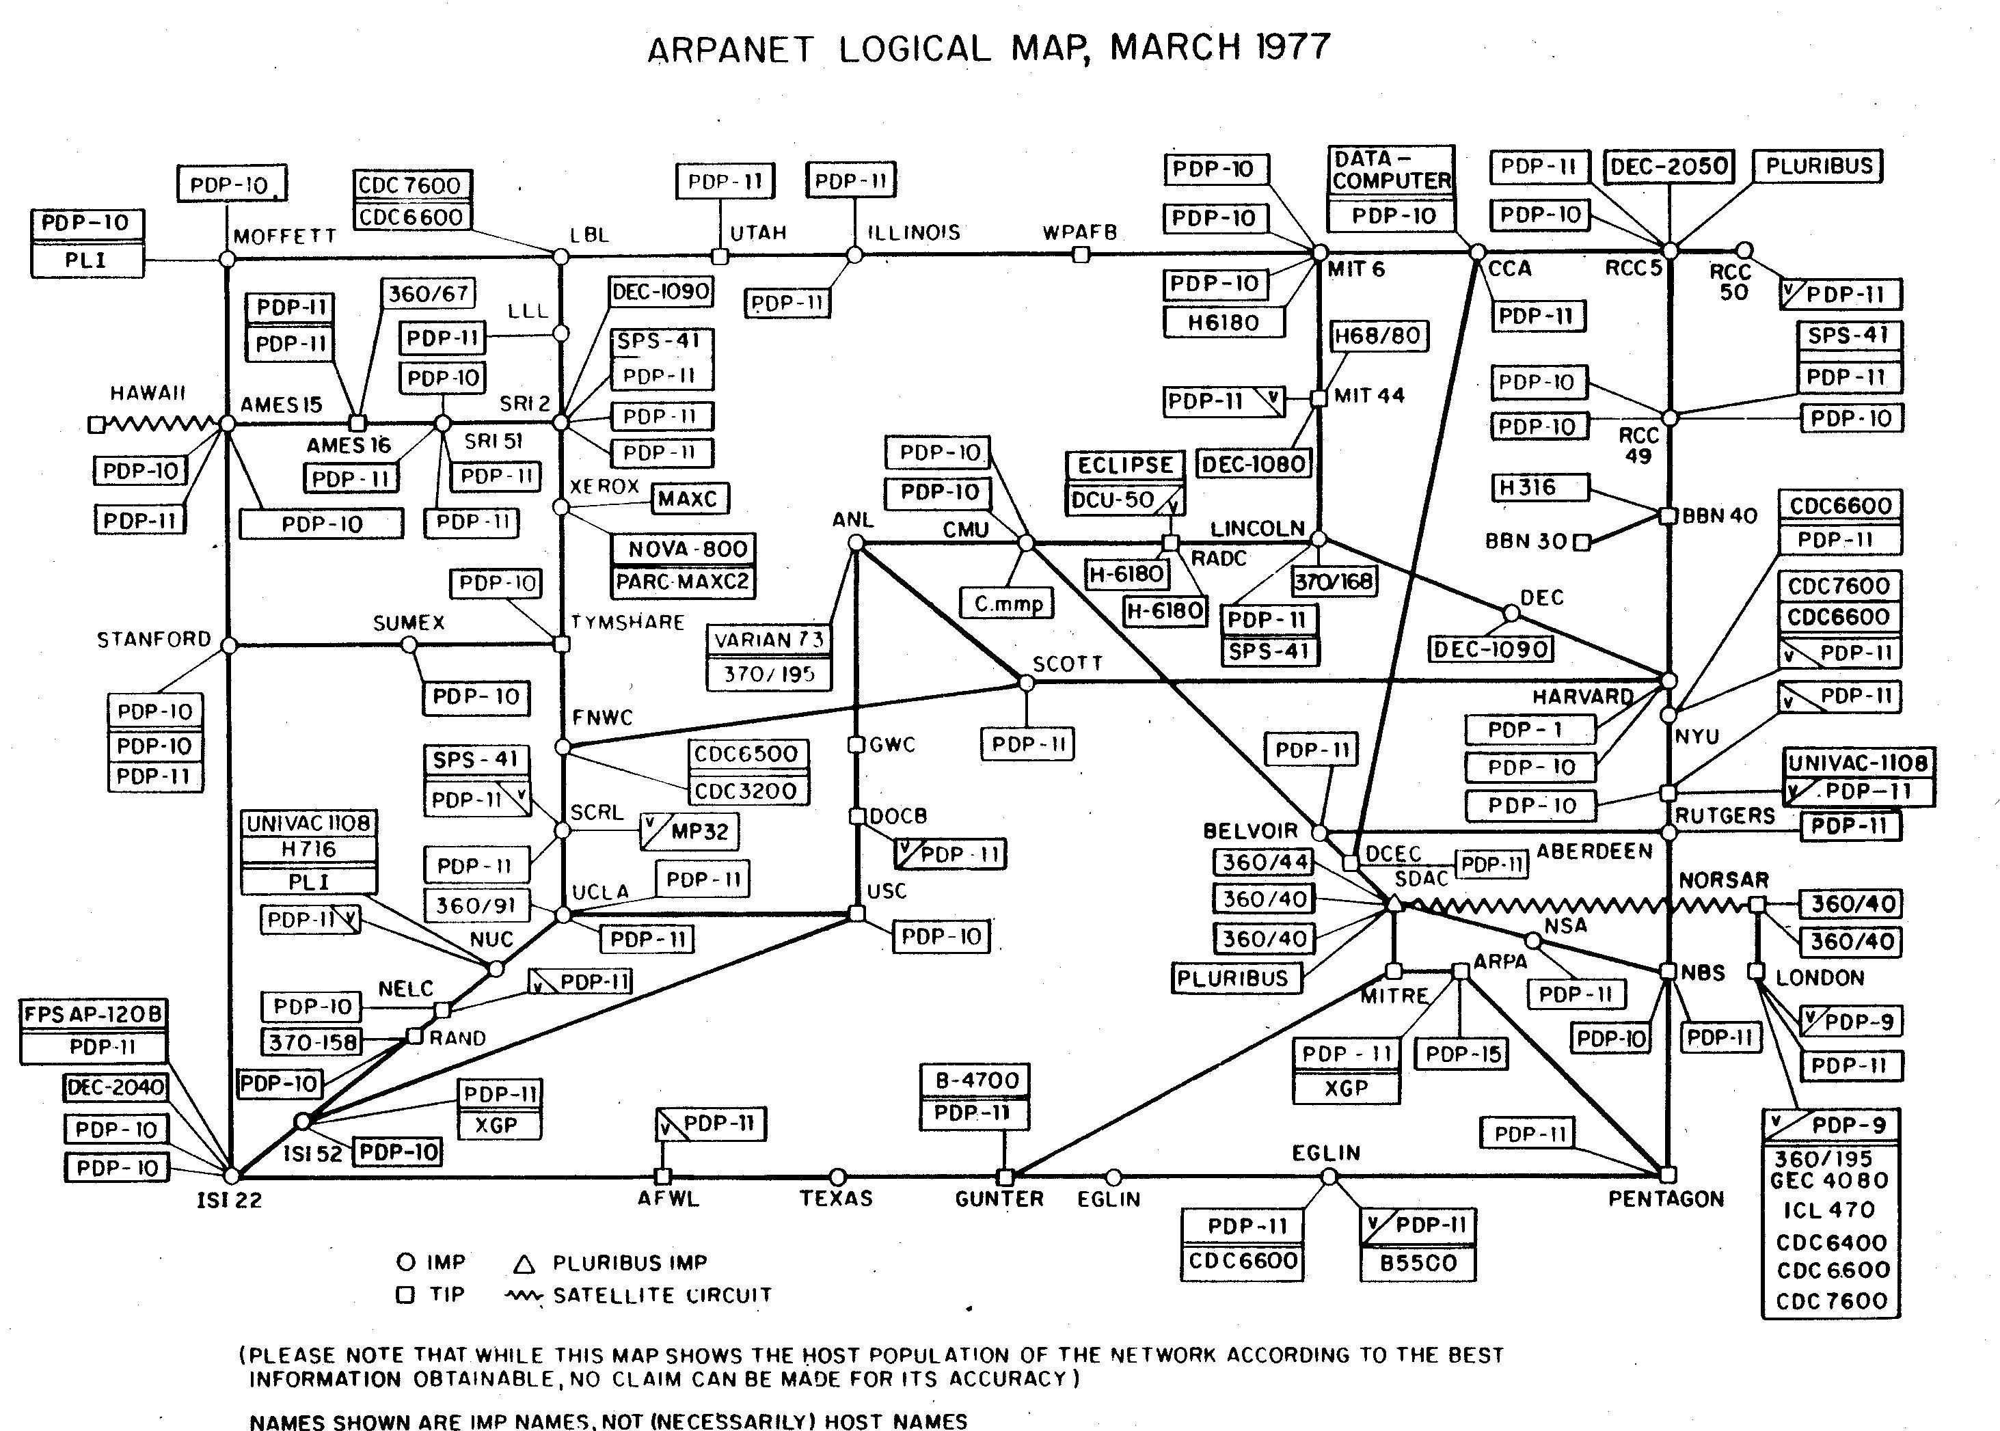 ARPANET i mars 1977.